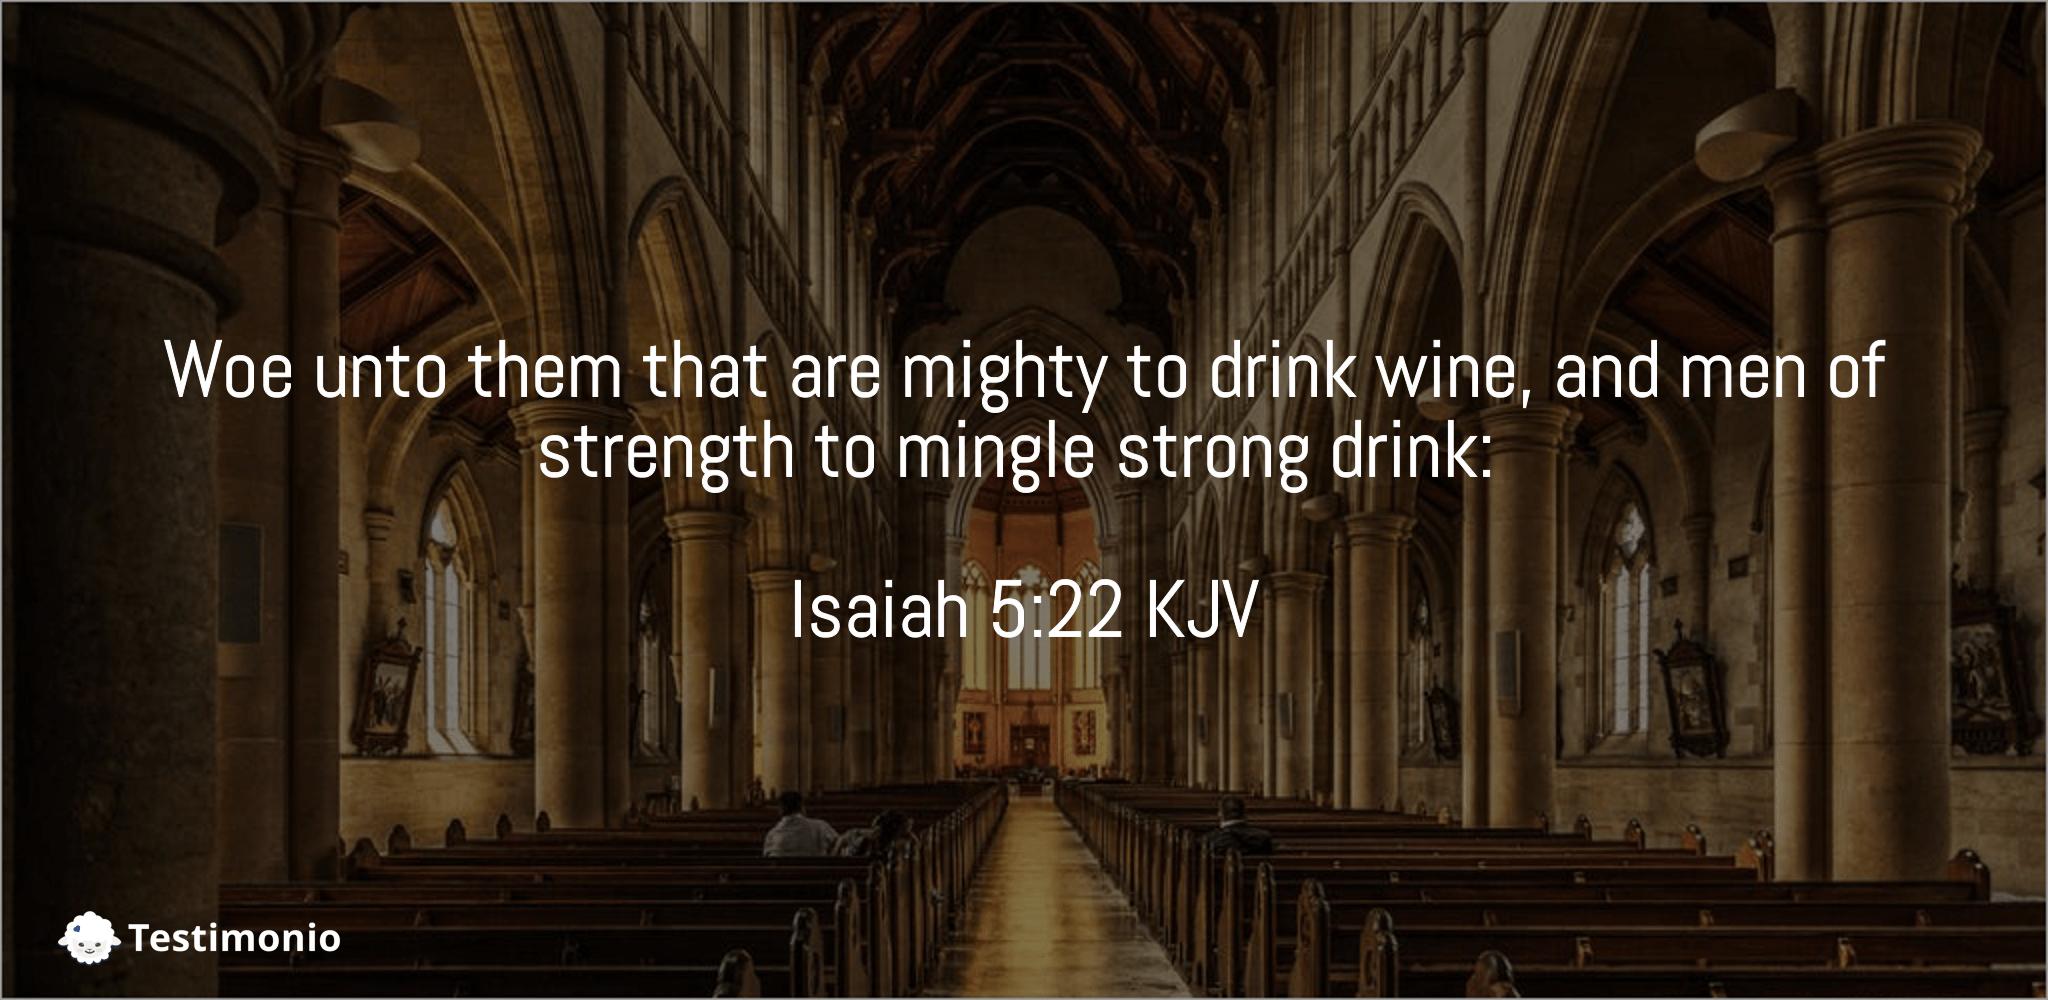 Isaiah 5:22